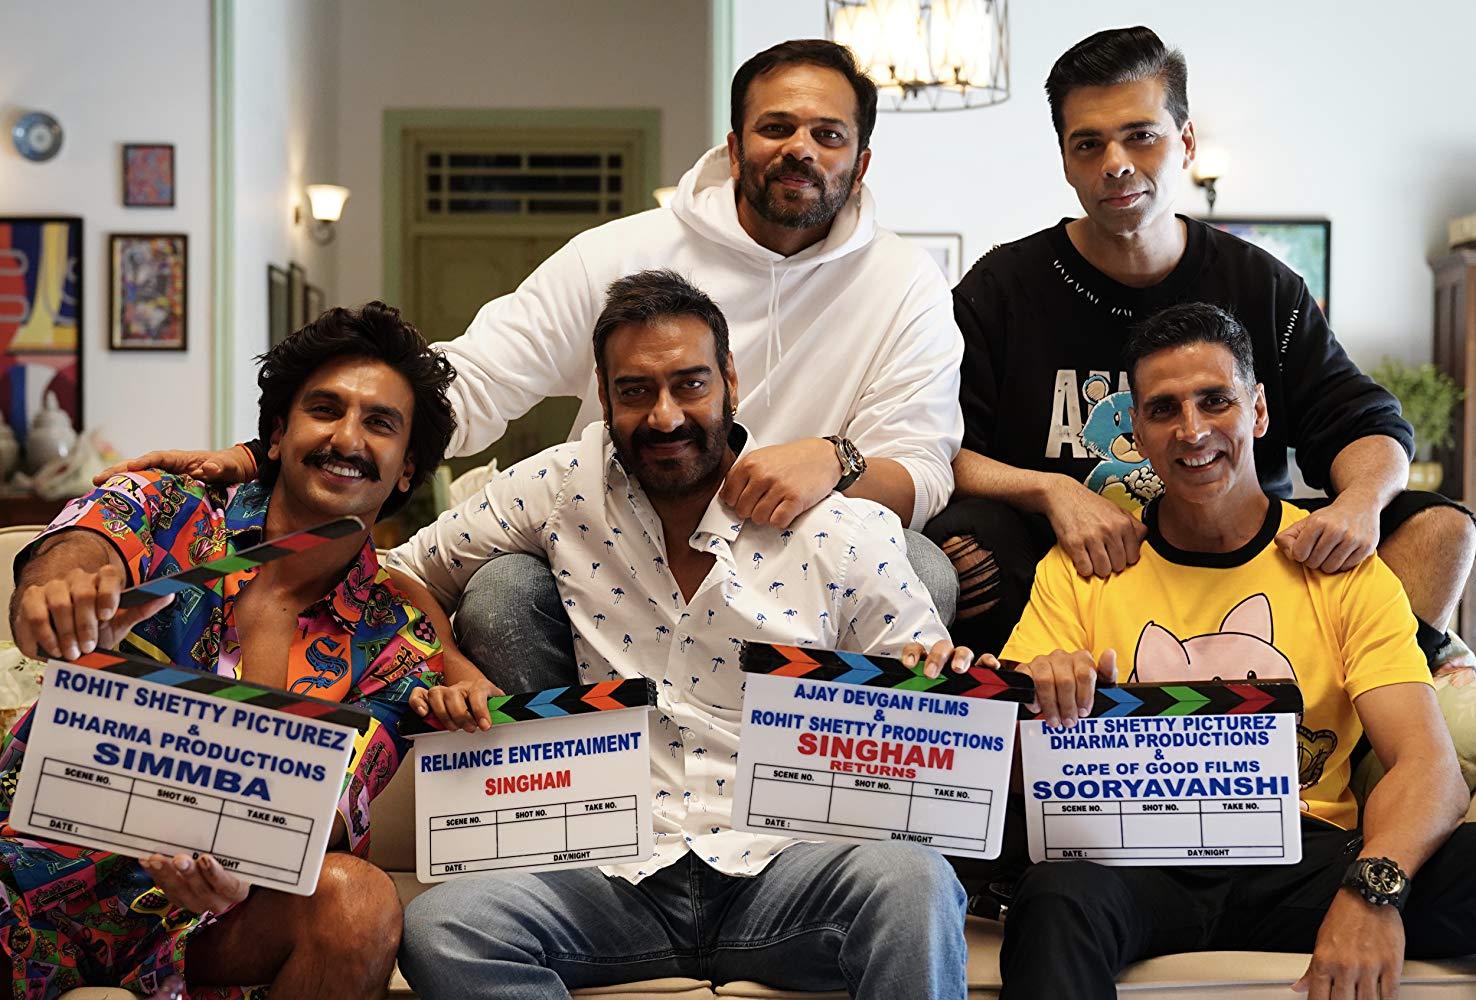 دانلود فیلم هندی اکشن سوریا وانشی Sooryavanshi